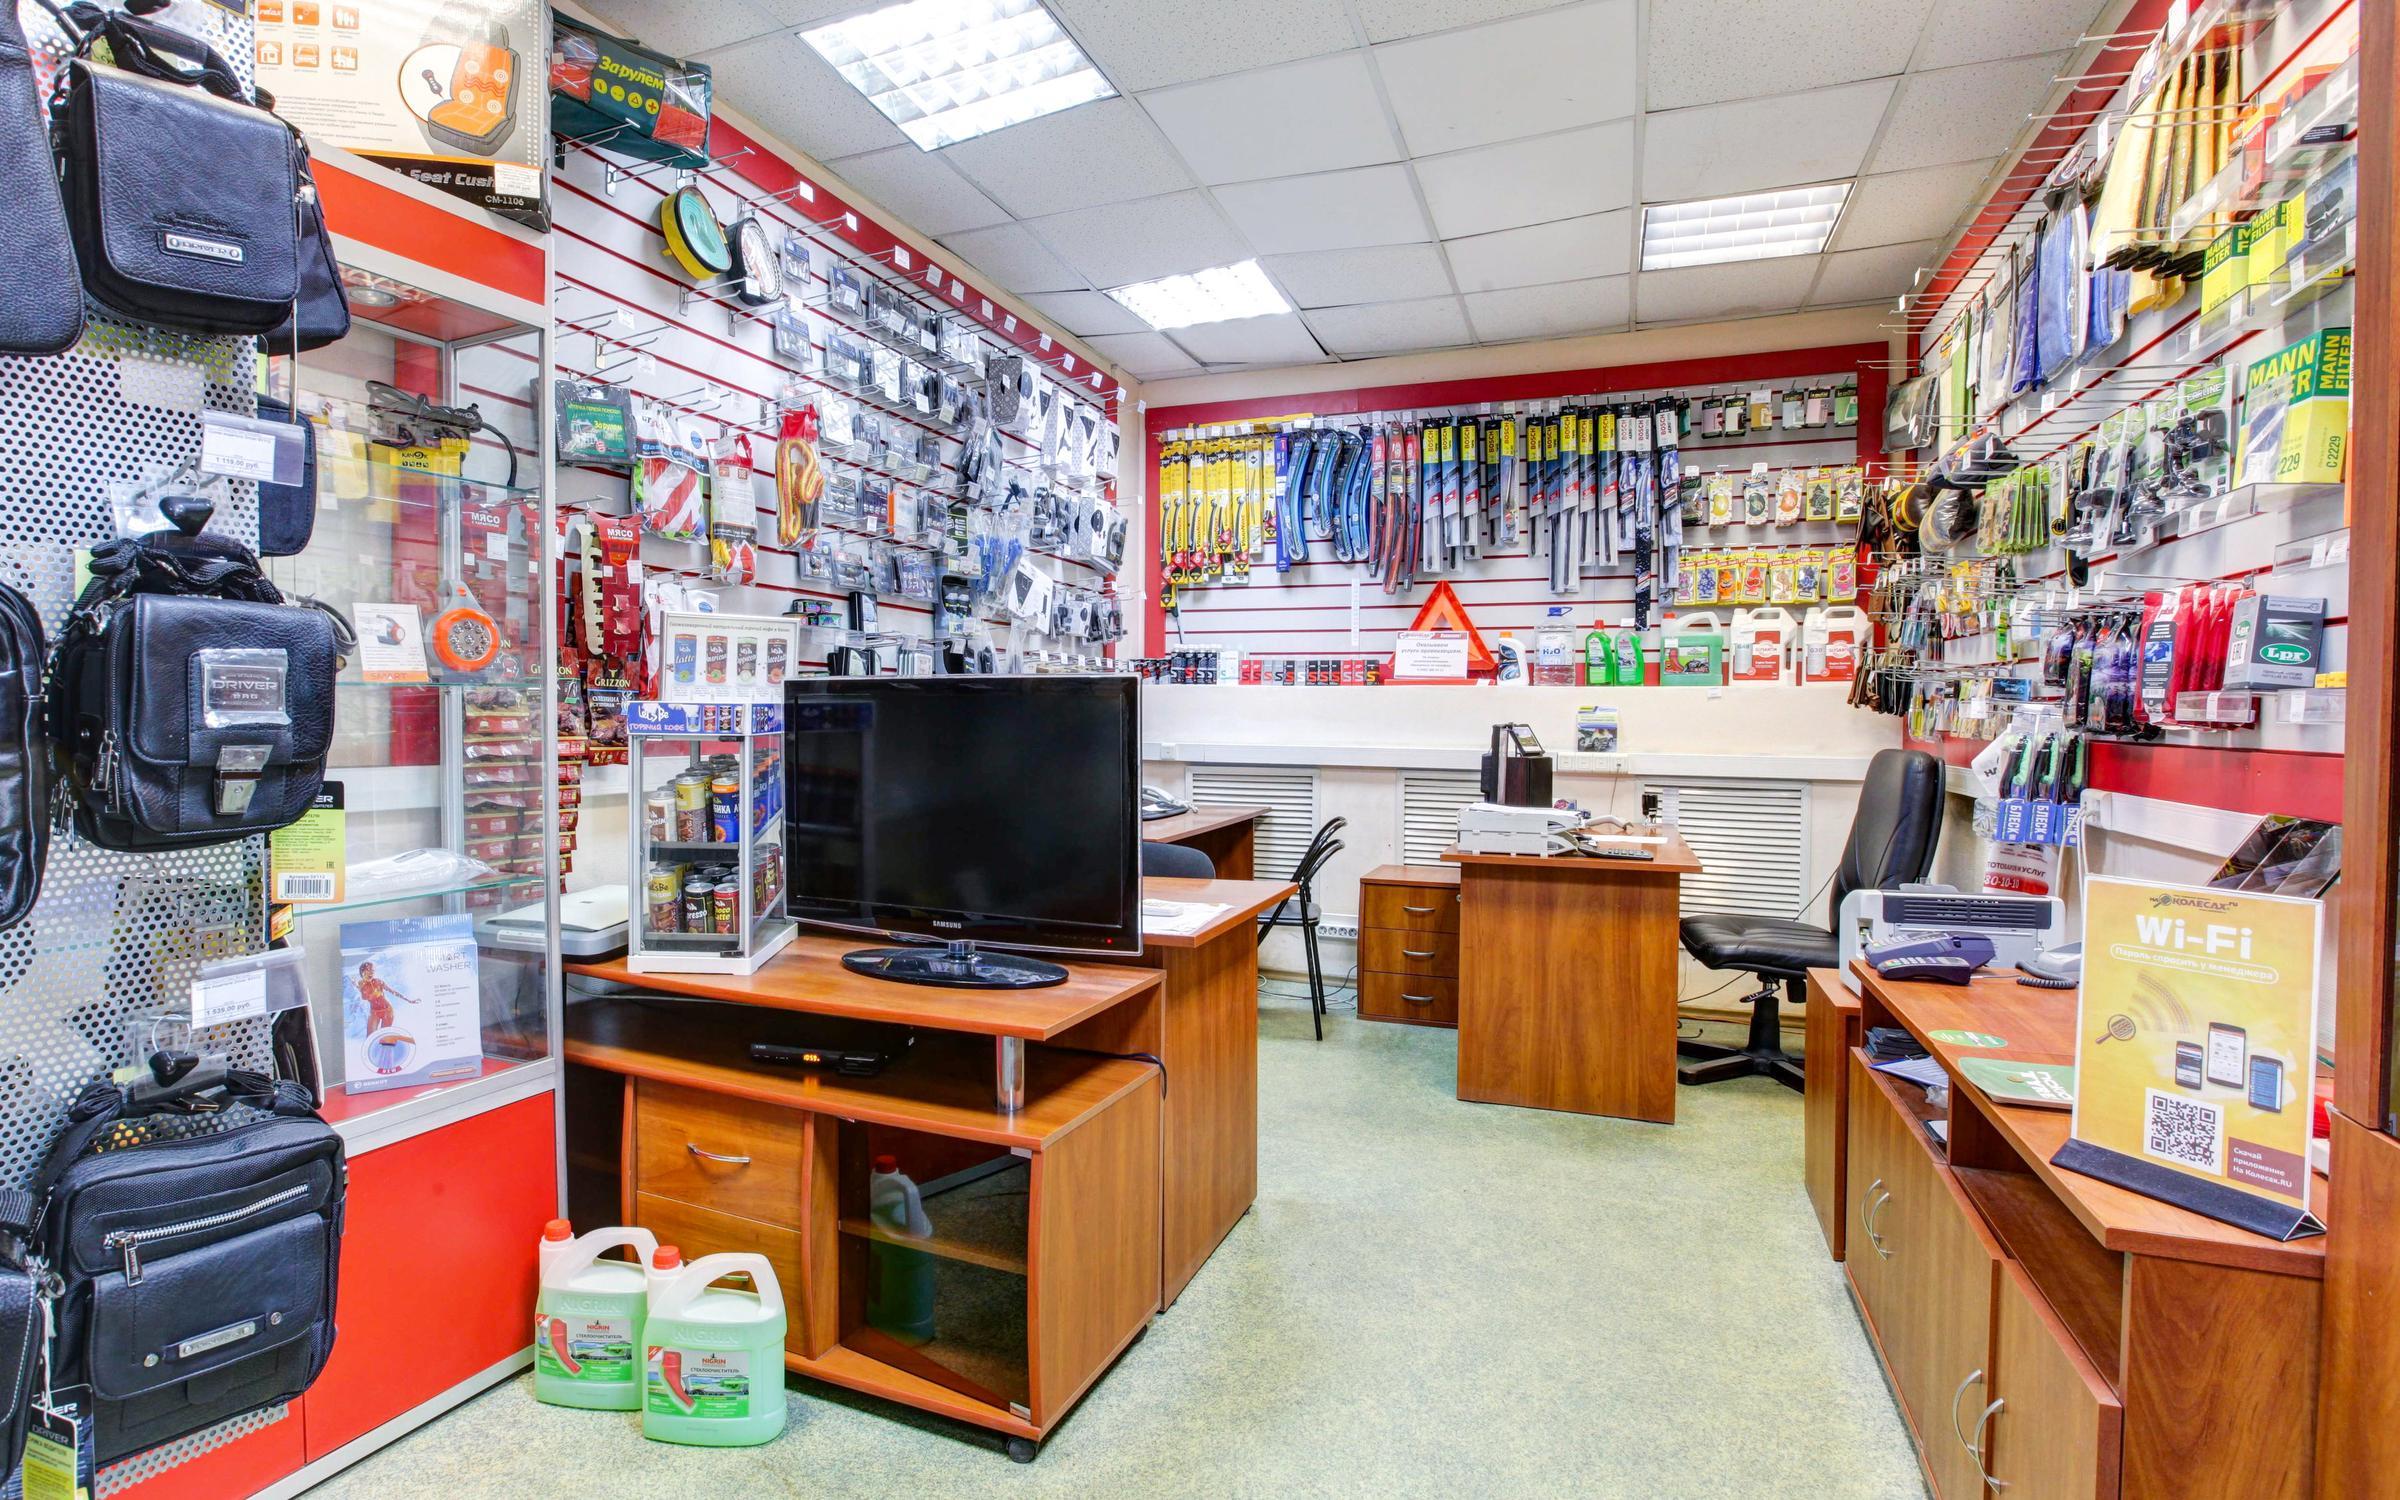 фотография Сервисного центра На Колесах.ru в Строгино